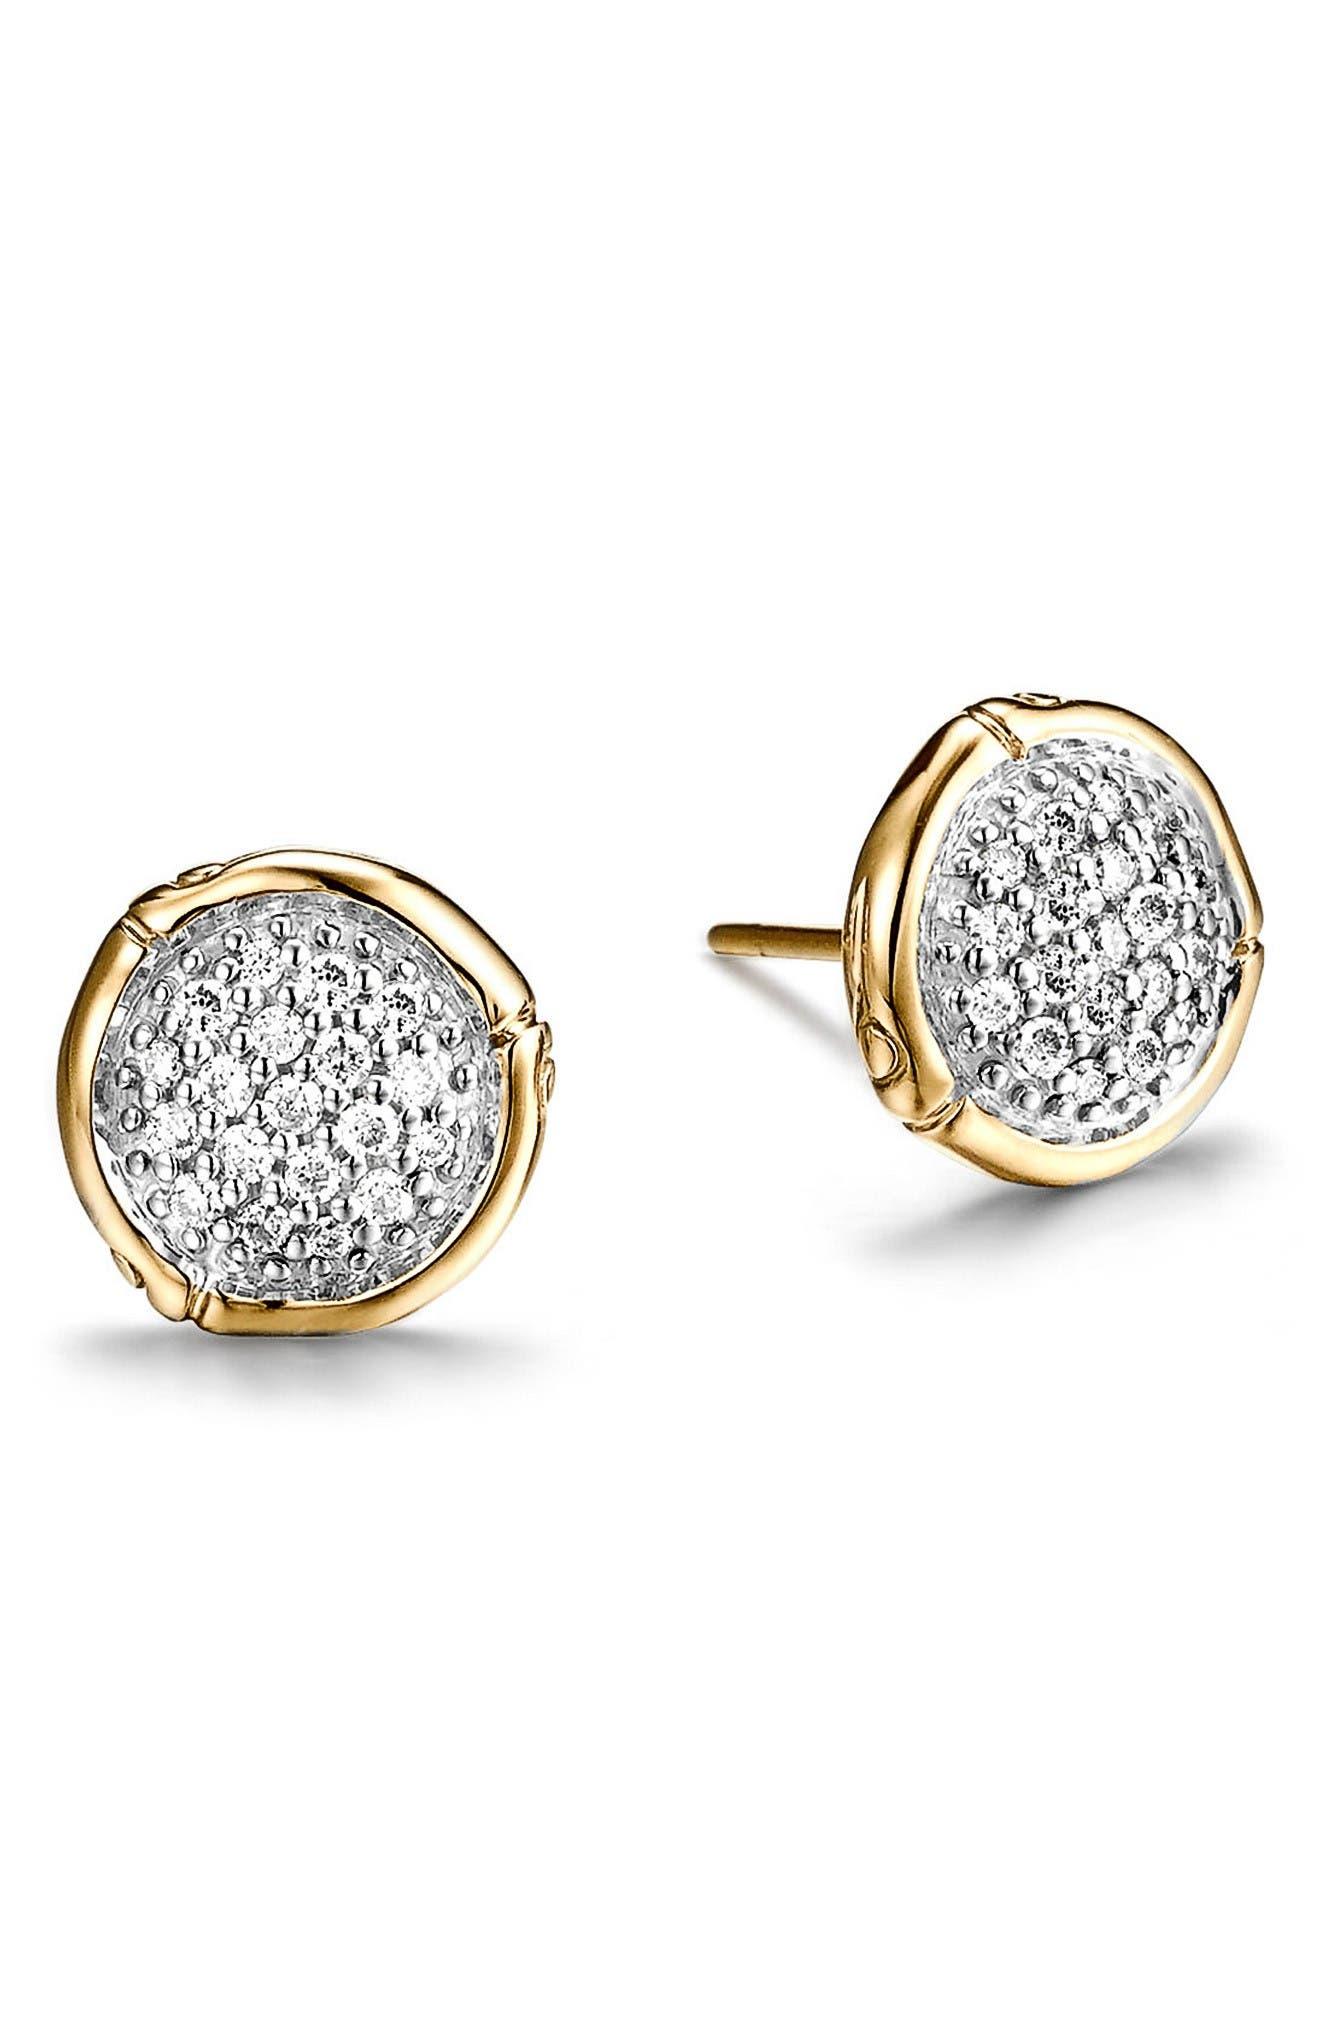 John Hardy Bamboo Diamond & 18k Gold Stud Earrings